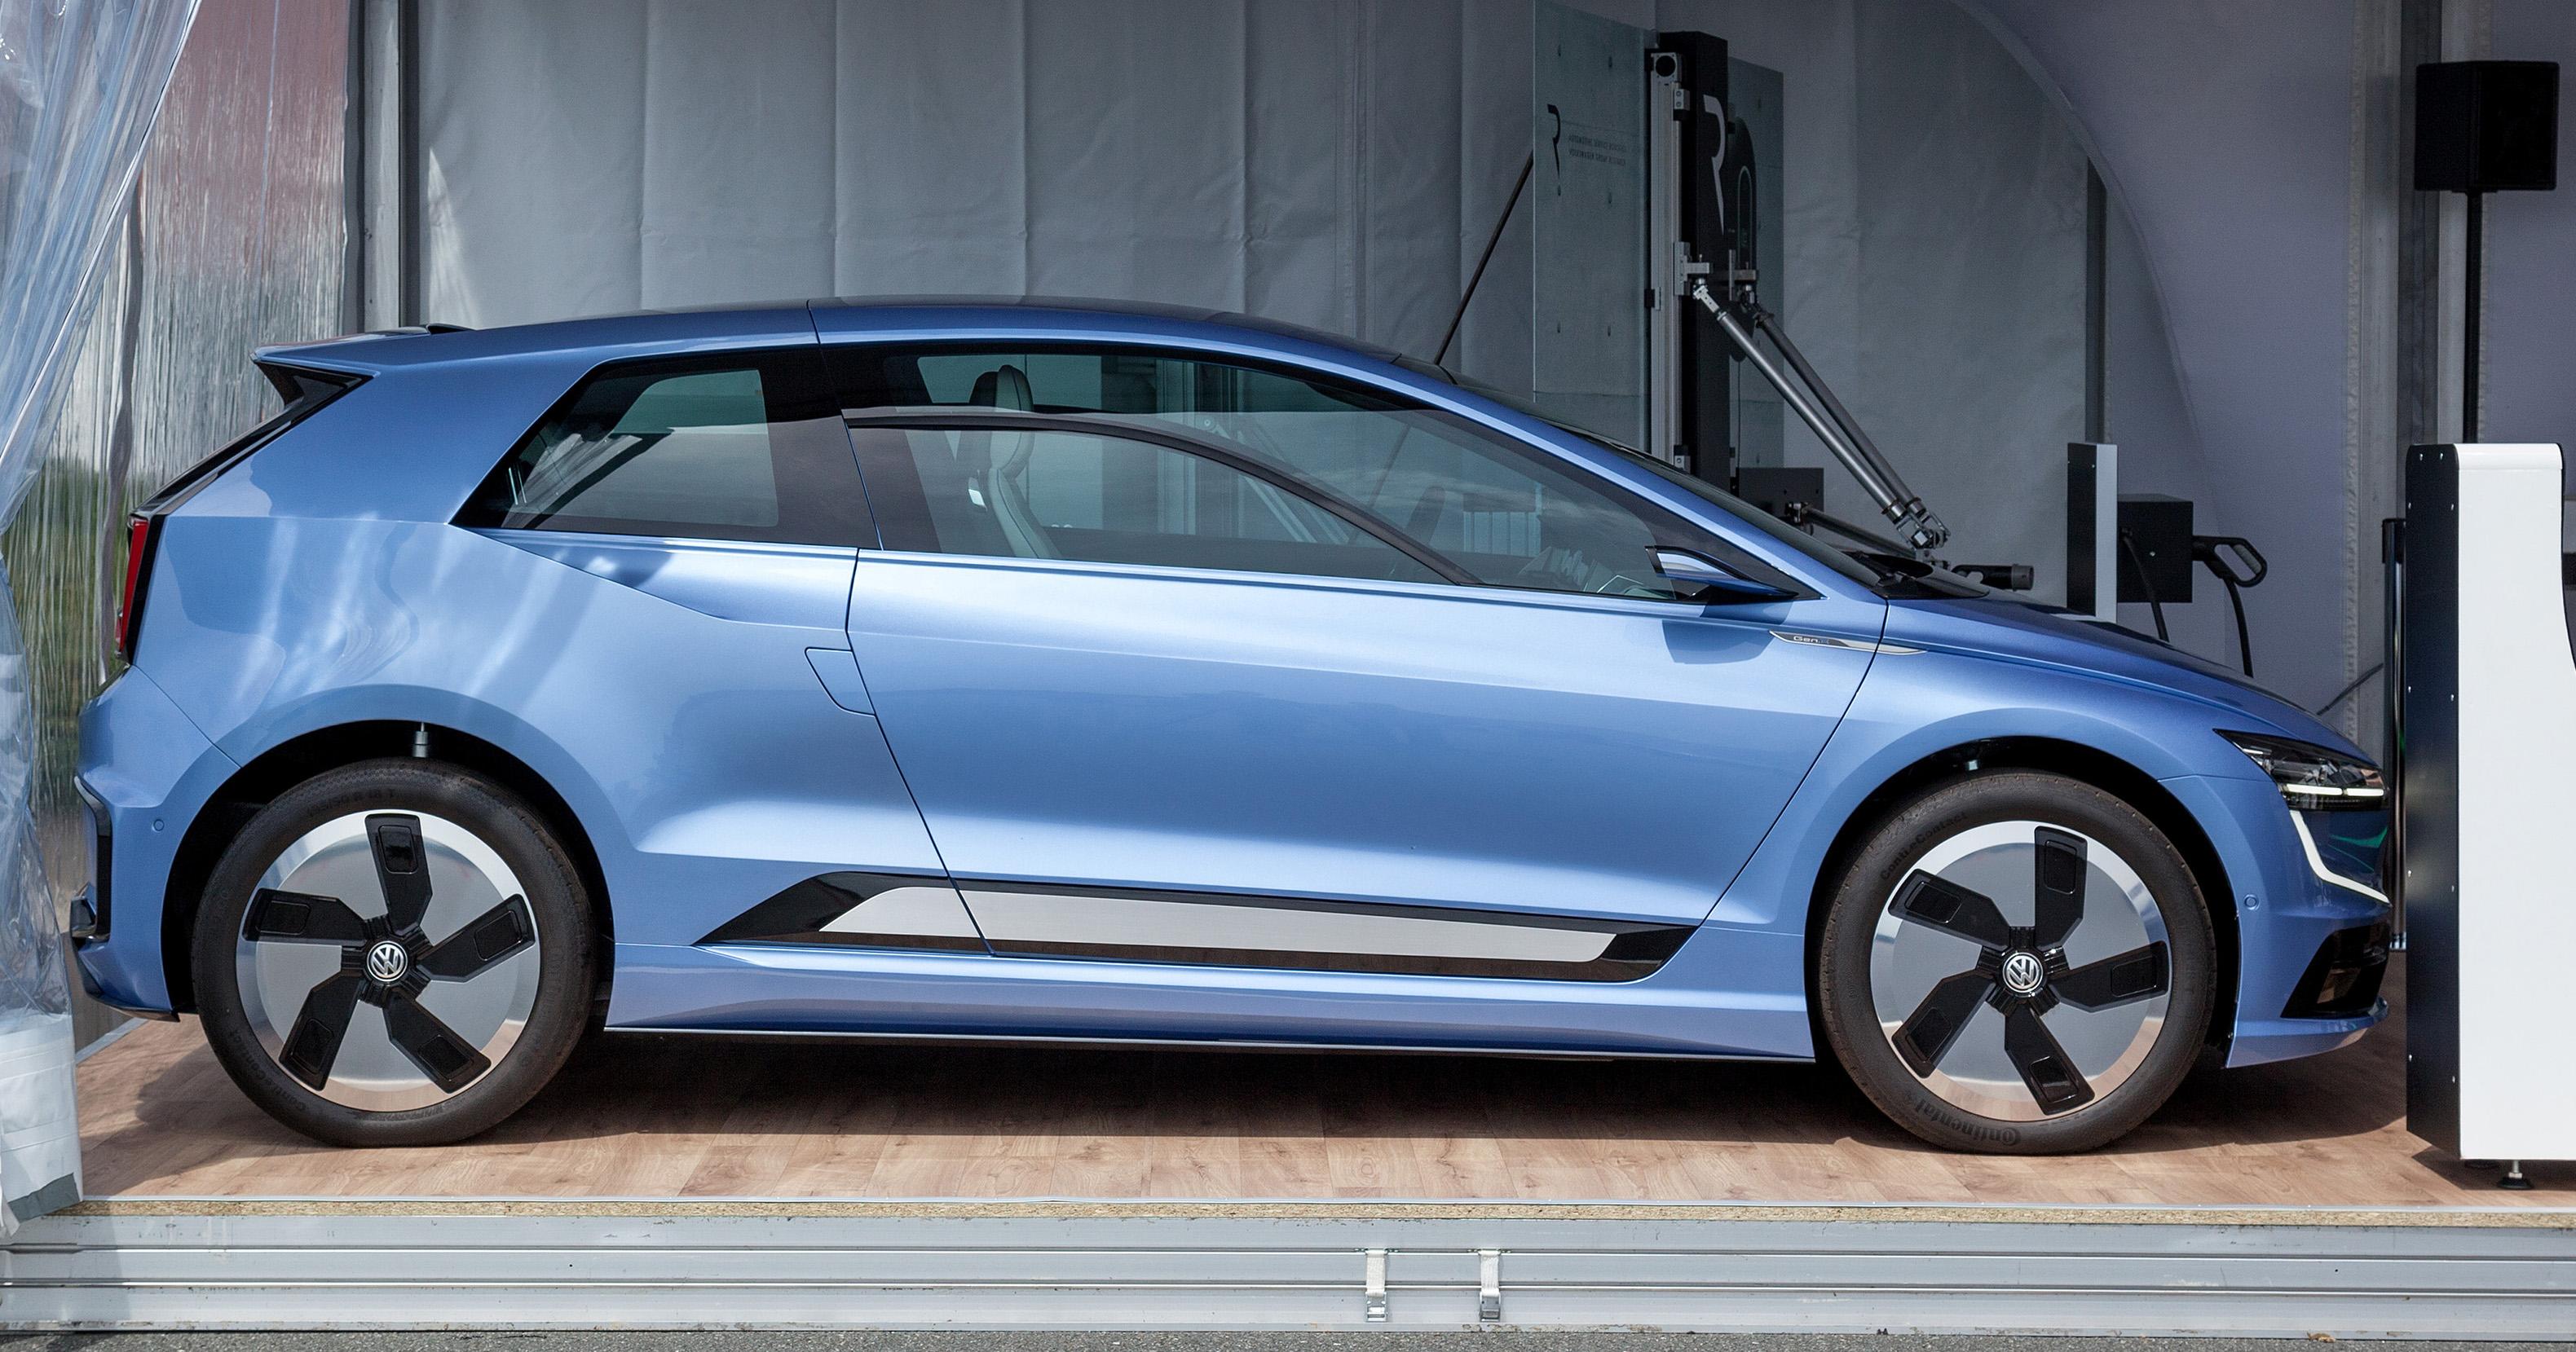 Volkswagen Gen E Concept Preview For Next Golf